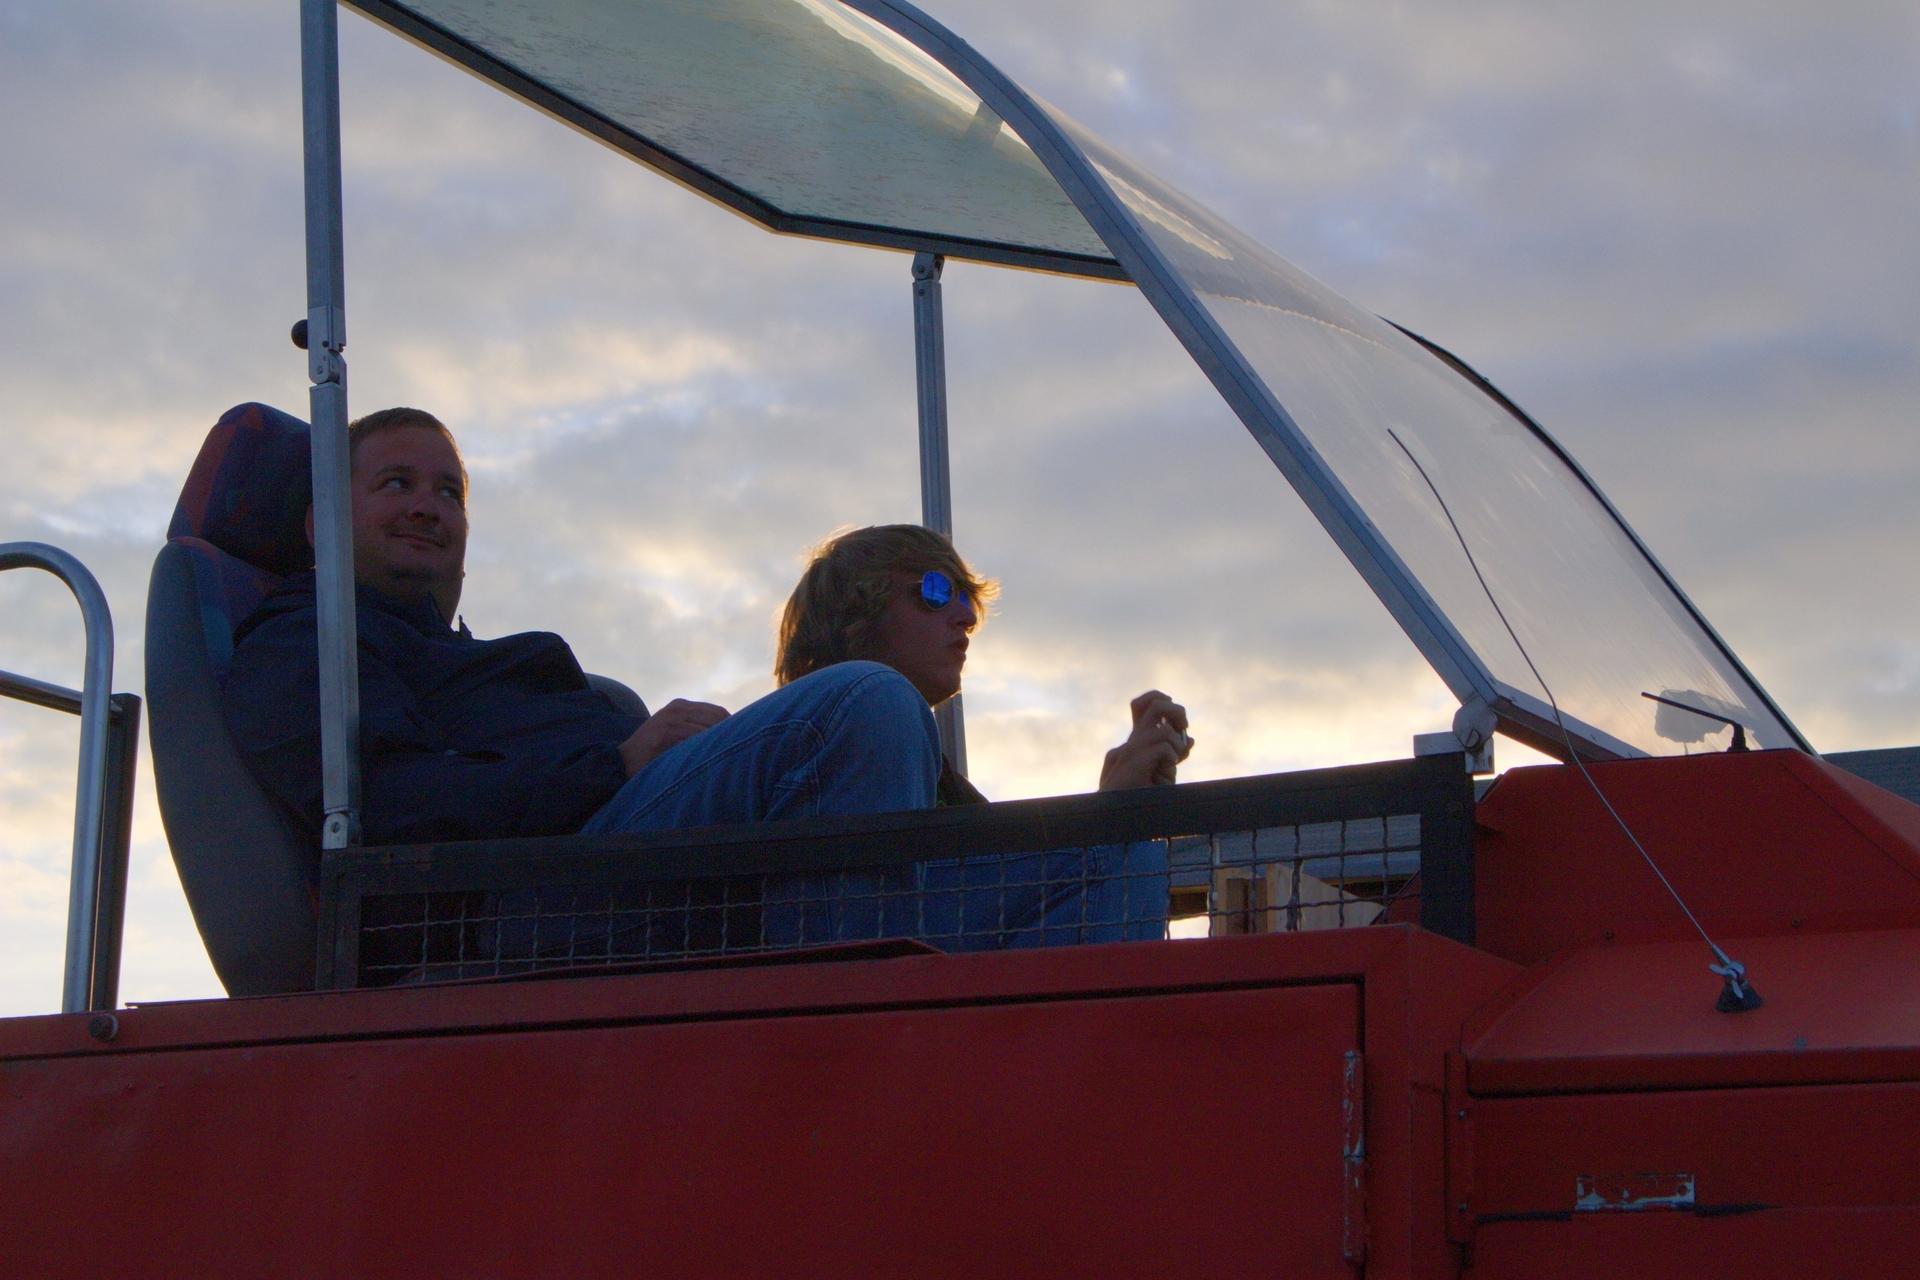 Till bei der Windenfahrer-Ausbildung - Johannes hilft